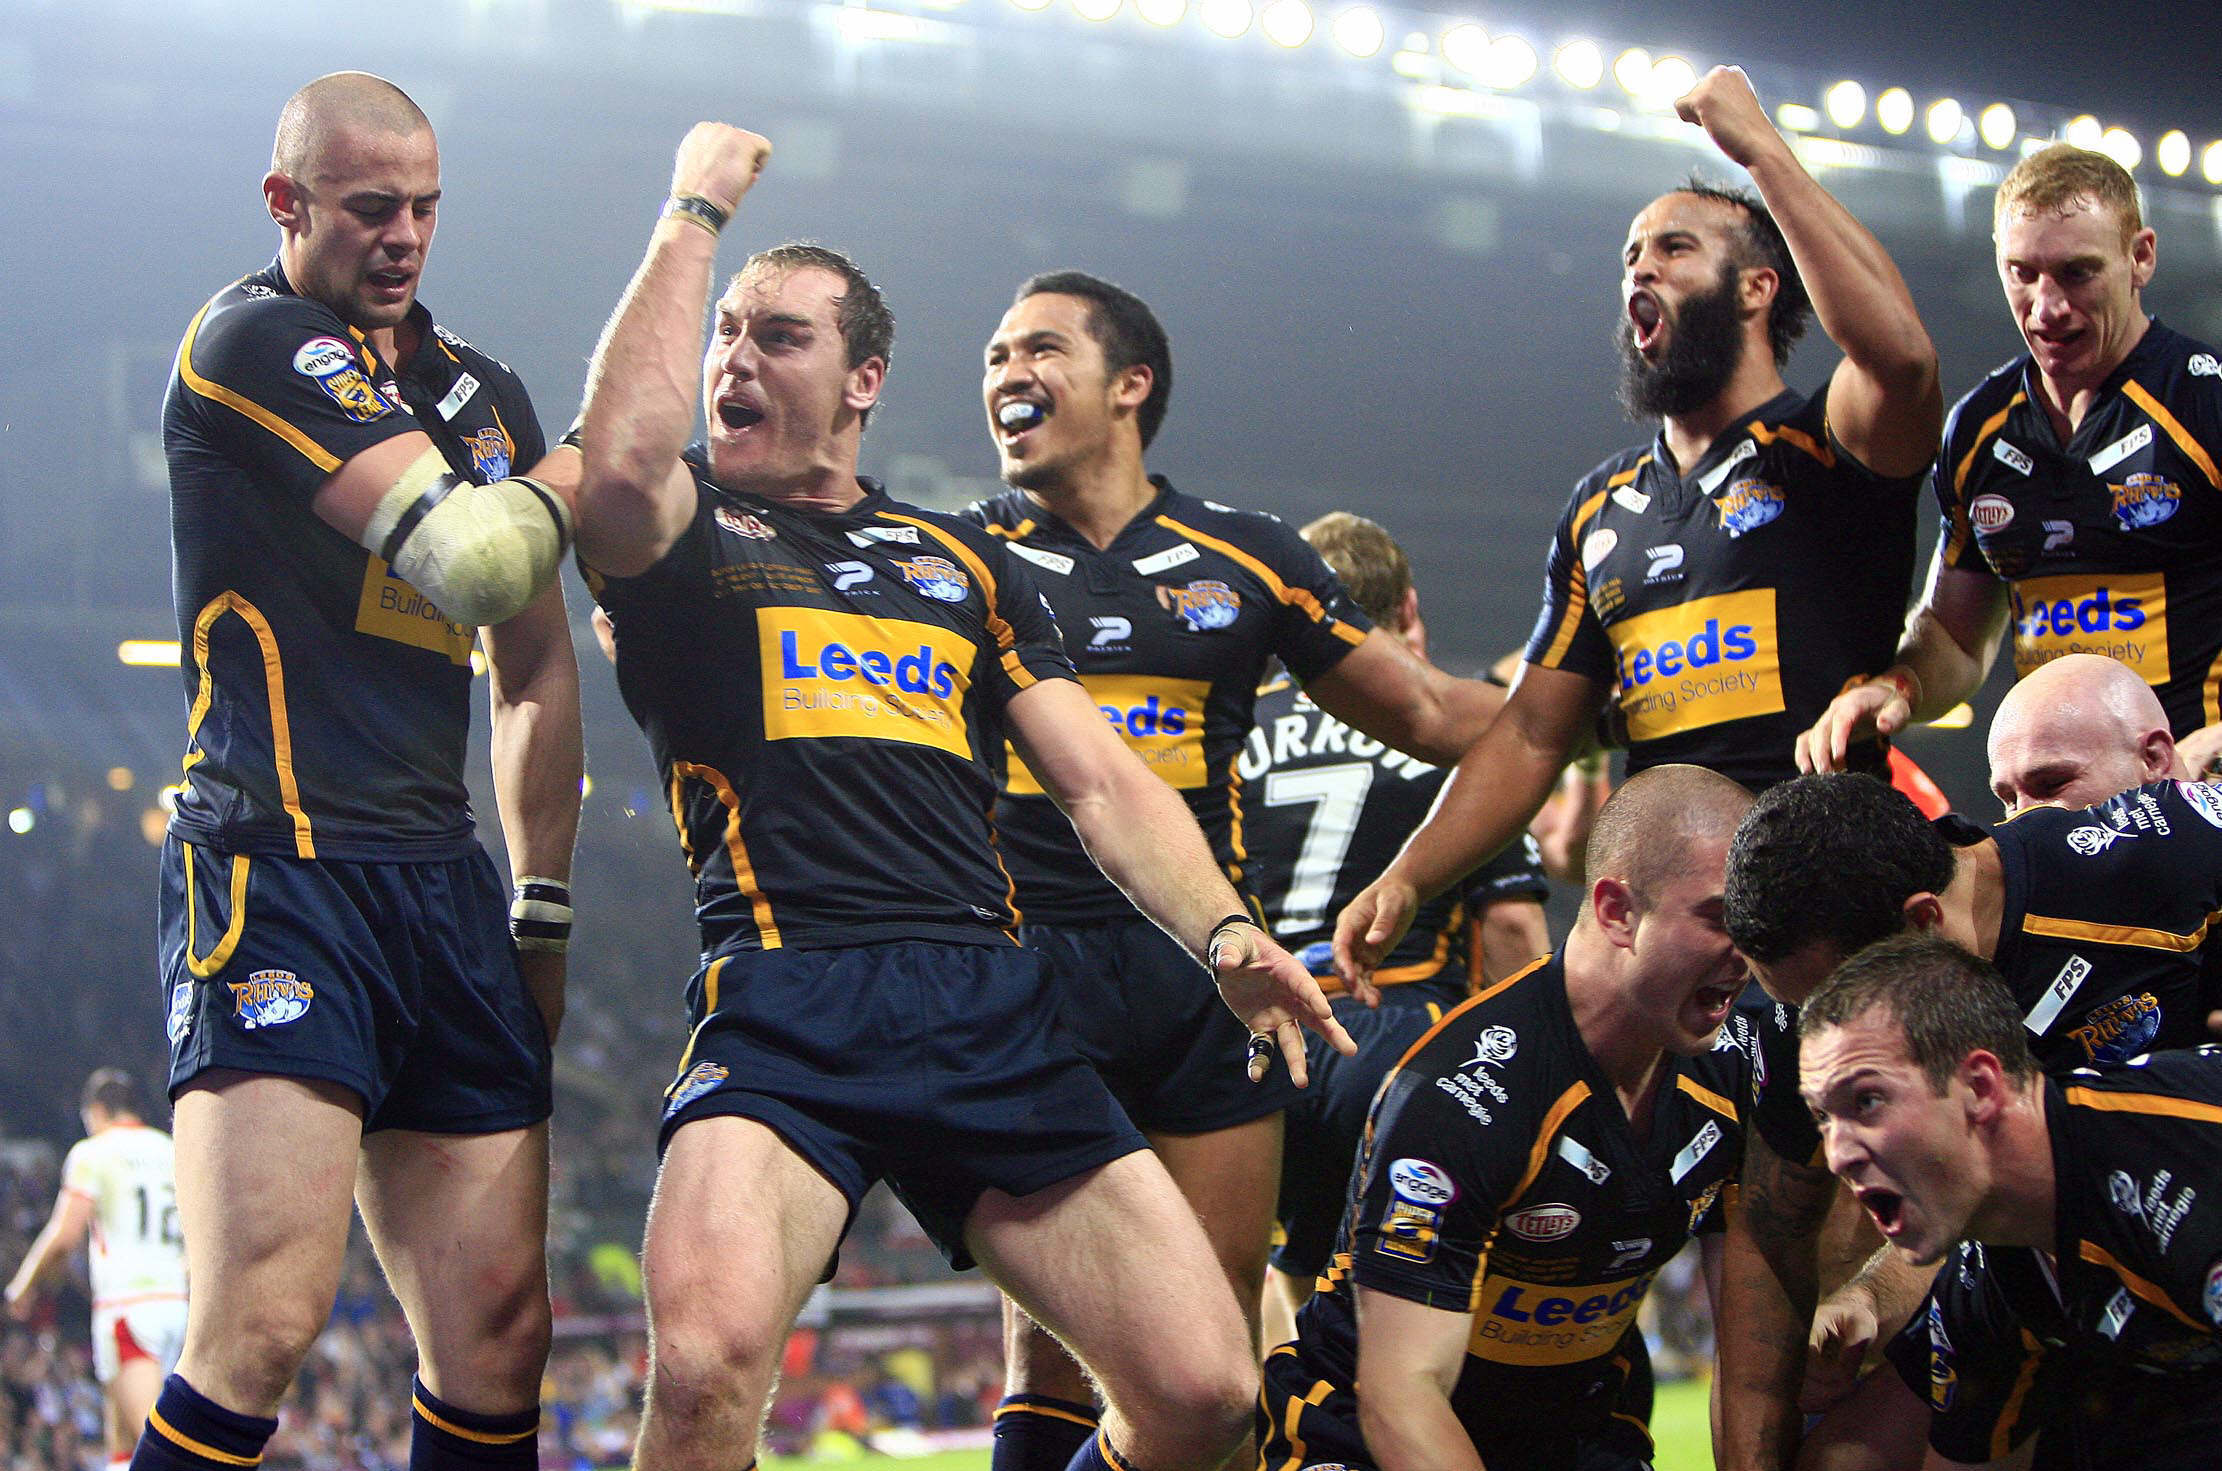 2007 Grand Final